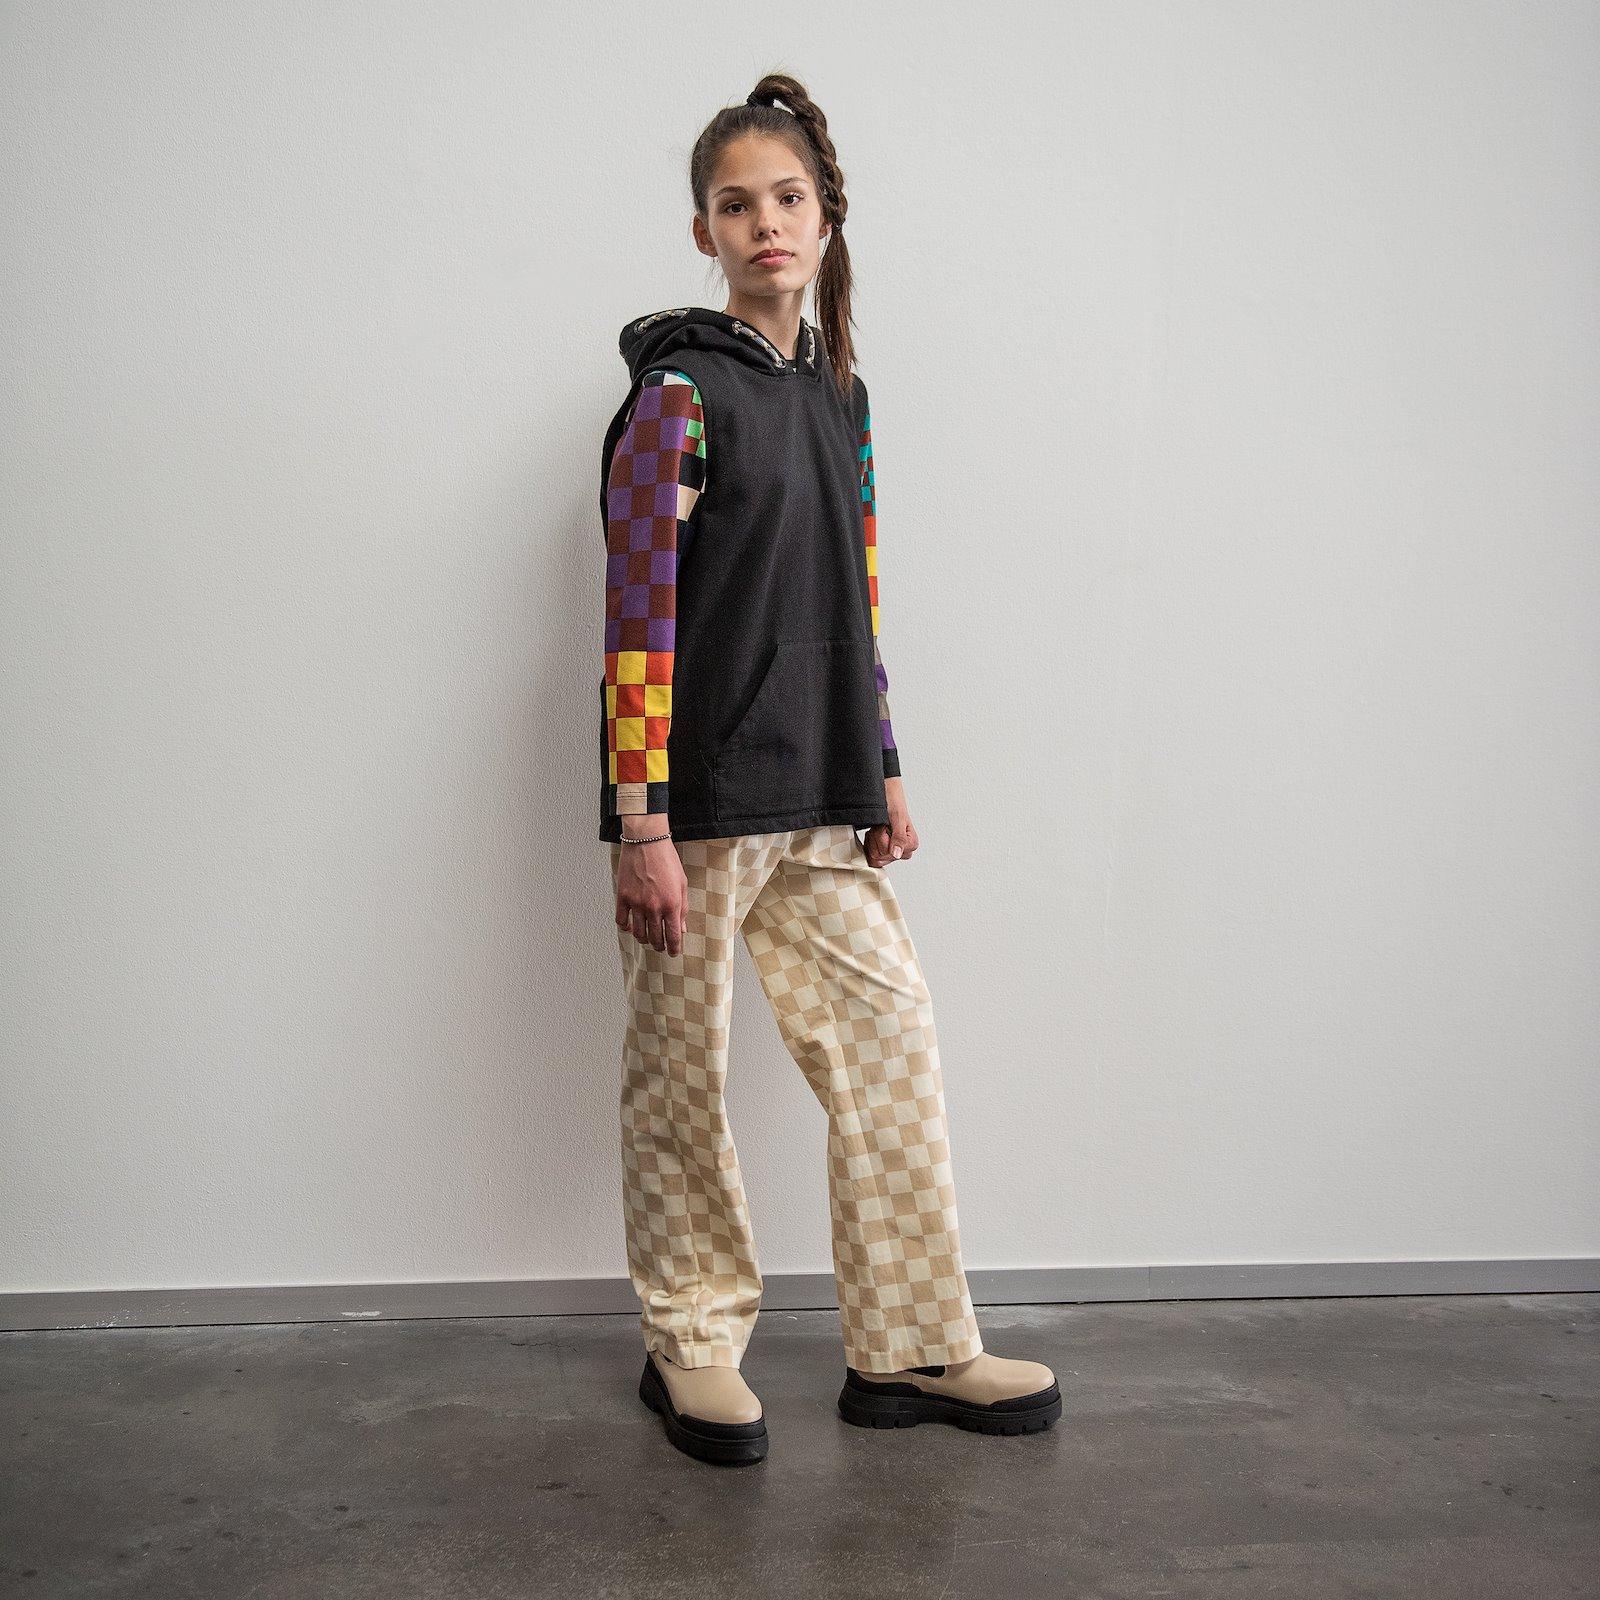 High waist and wide lege trouser, 140/10 p62021_211759_230638_43690_22276_p62017_272807_p60034_420420_sskit